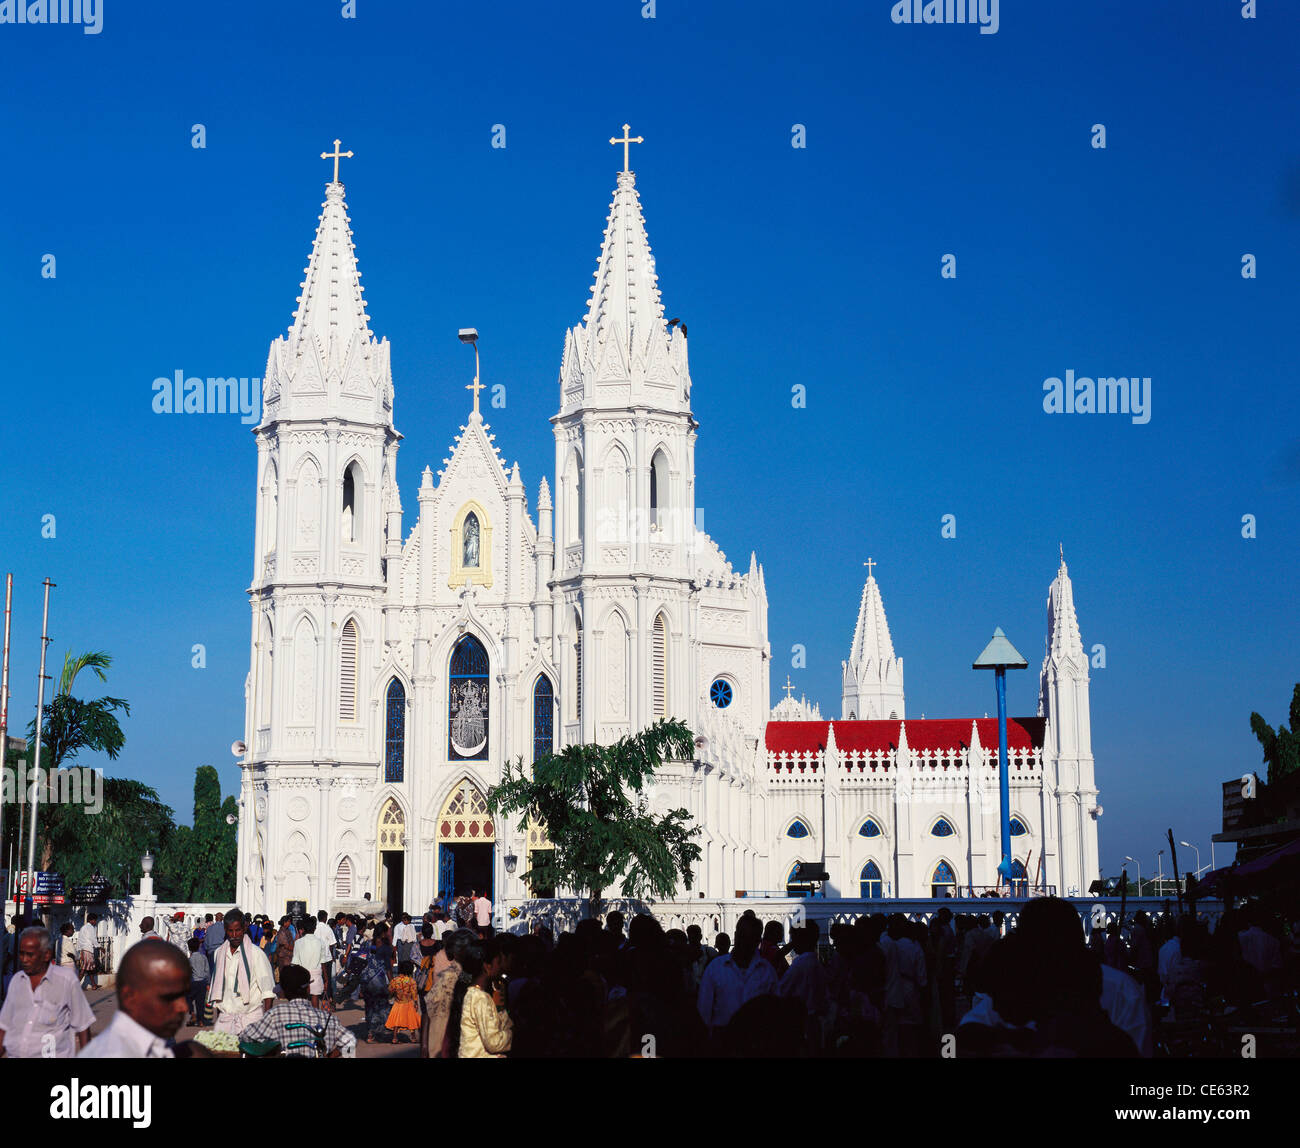 Basilica of Our Lady of Good Health ; Sanctuary of Our Lady of  Vailankanni ; Velankani Church ; Velankanni ; Tamil Nadu ; India ; Asia Stock Photo